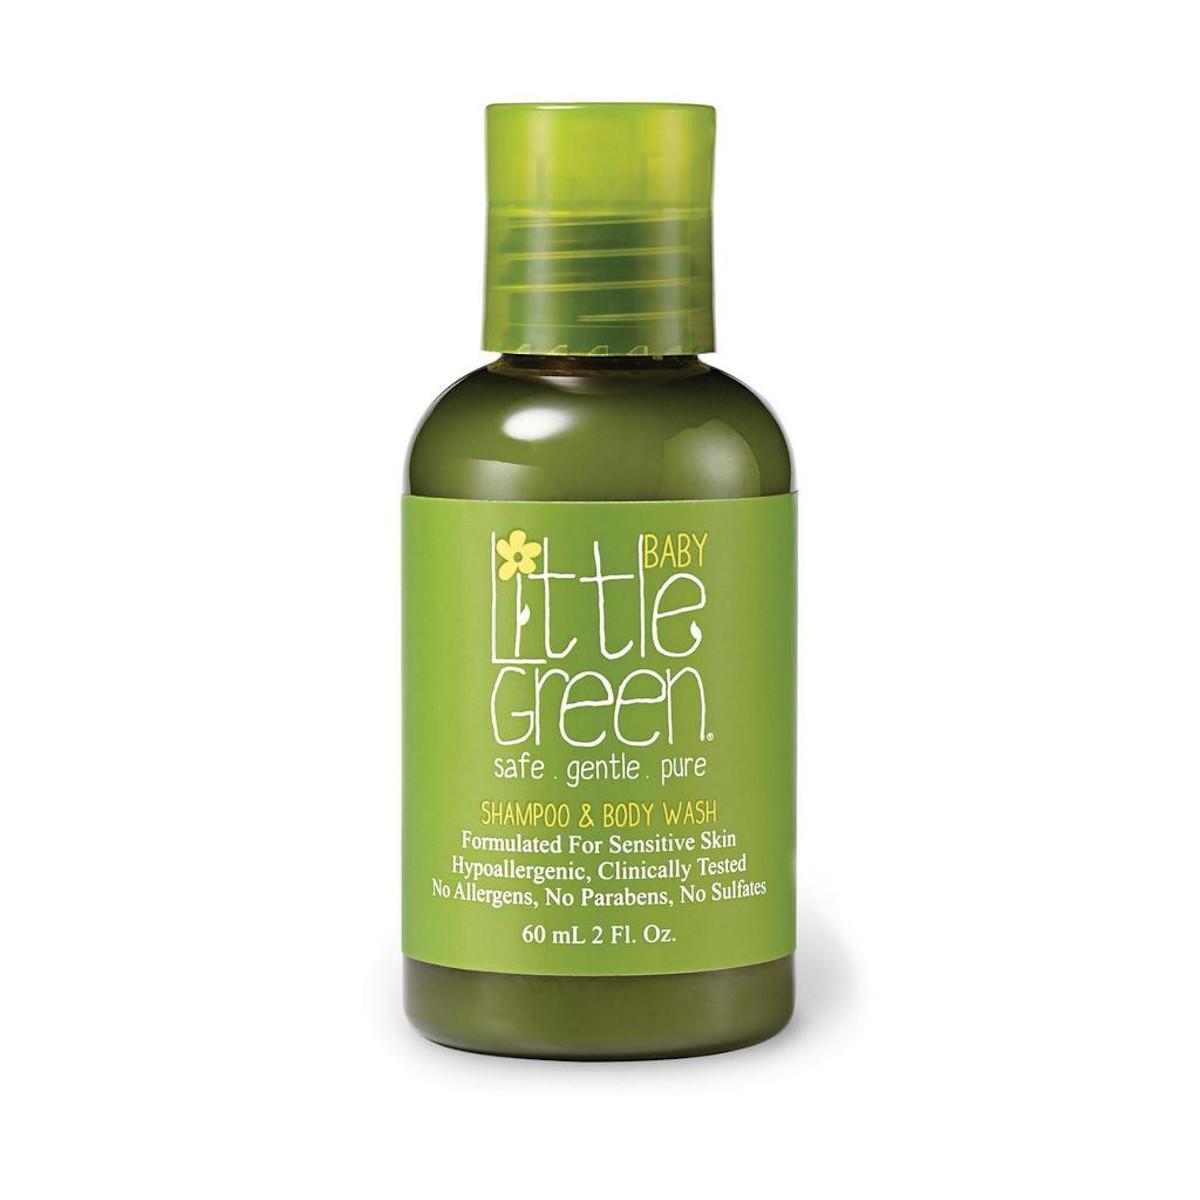 Шампунь и гель для тела Little Green Без Слез Shampoo & Body Wash Baby 60 мл